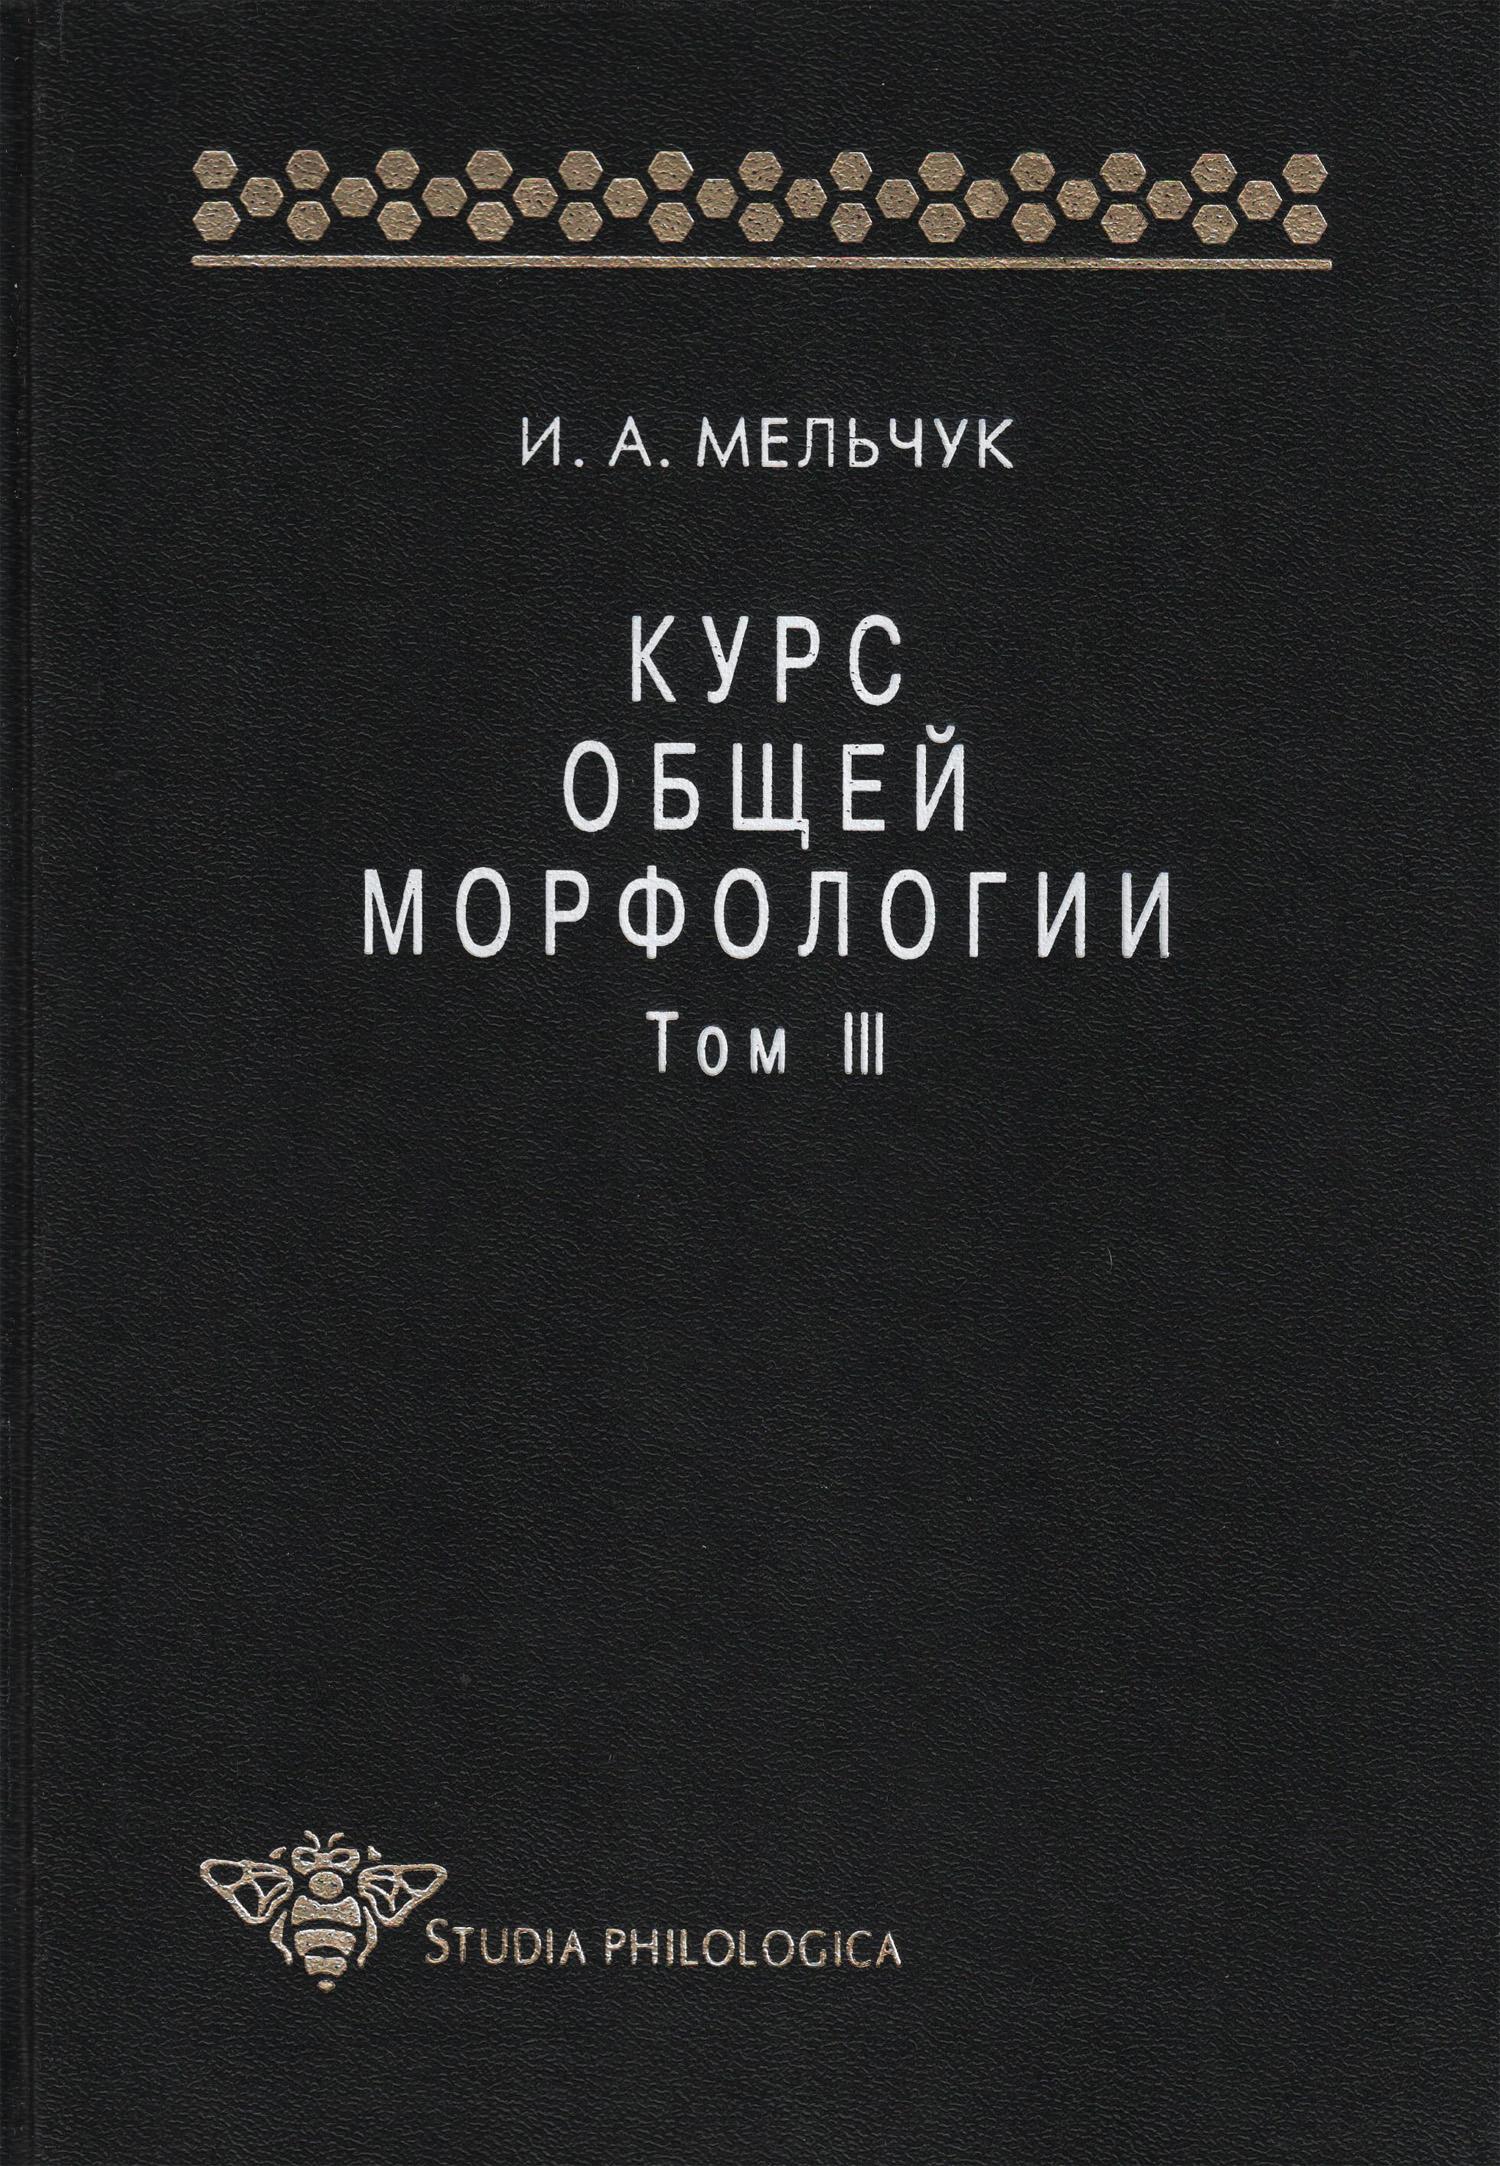 Курс общей морфологии. Том III